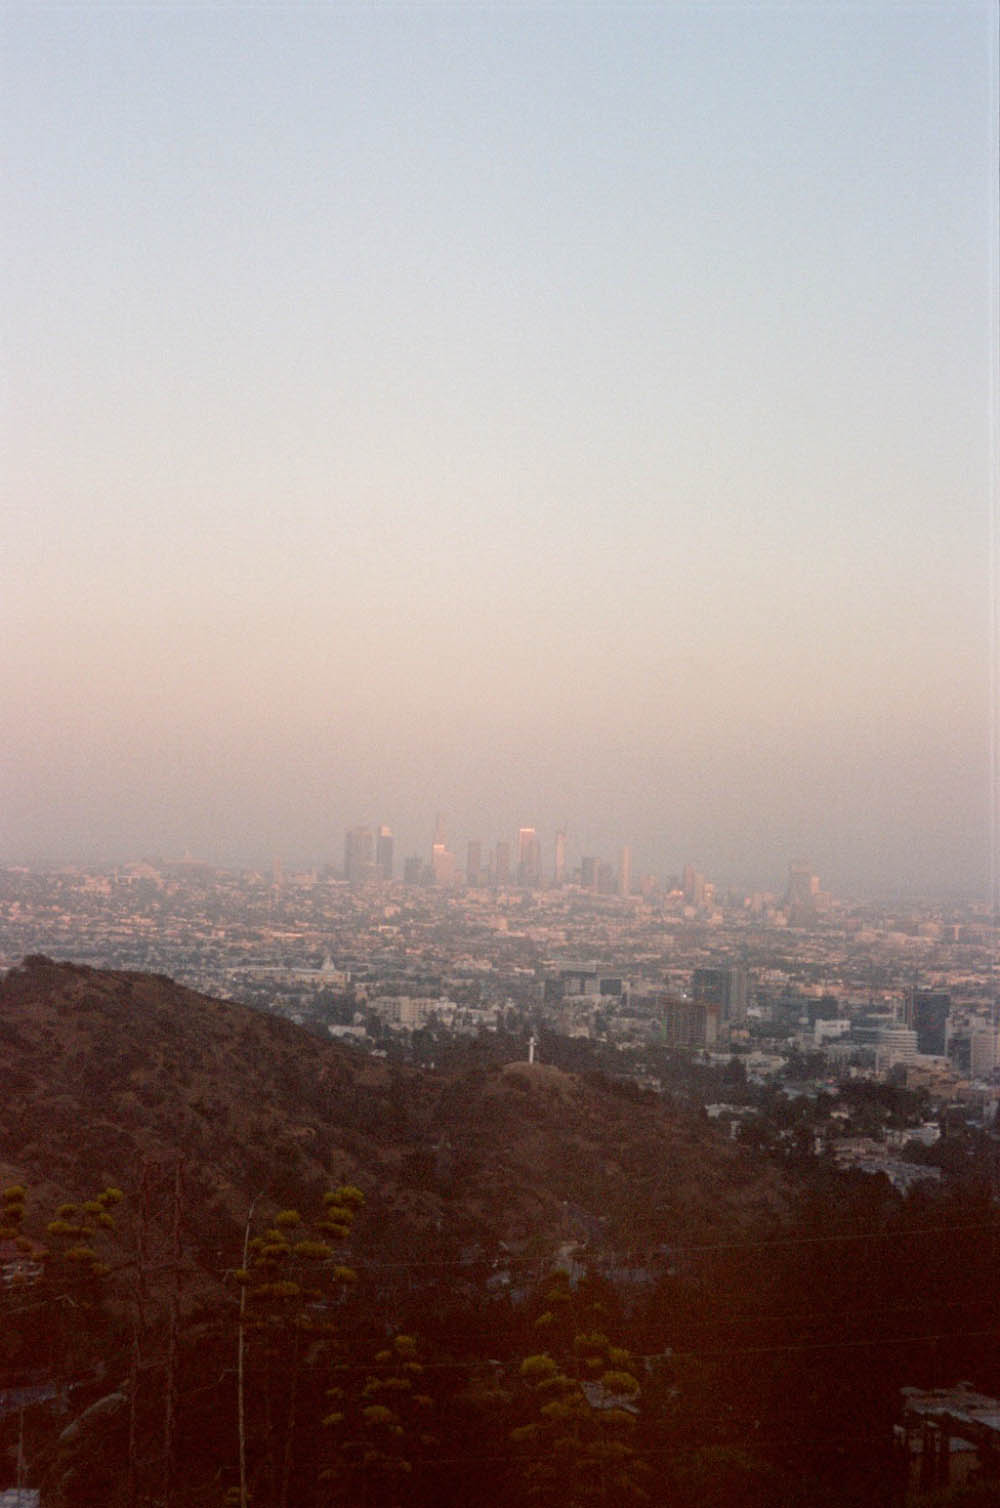 Los Angeles, May 2016 © Emma Elizabeth Tillman, by courtesy of the artist